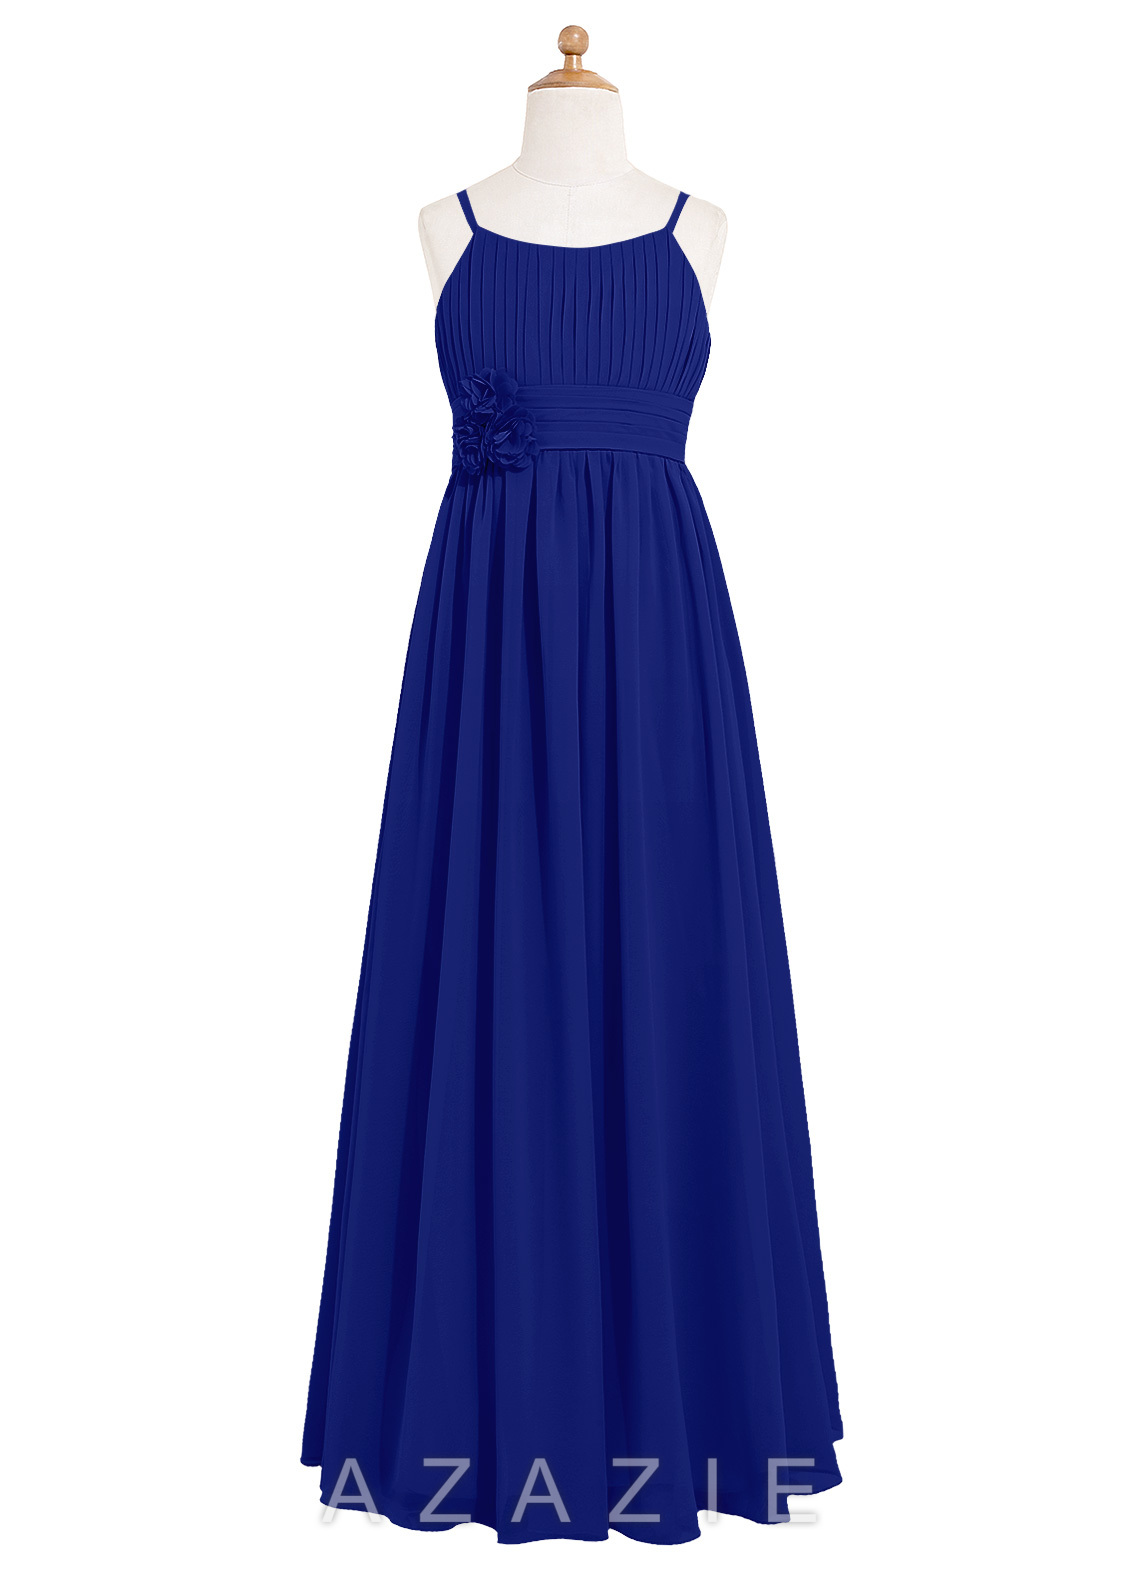 Azazie Astrid JBD Junior Bridesmaid Dress